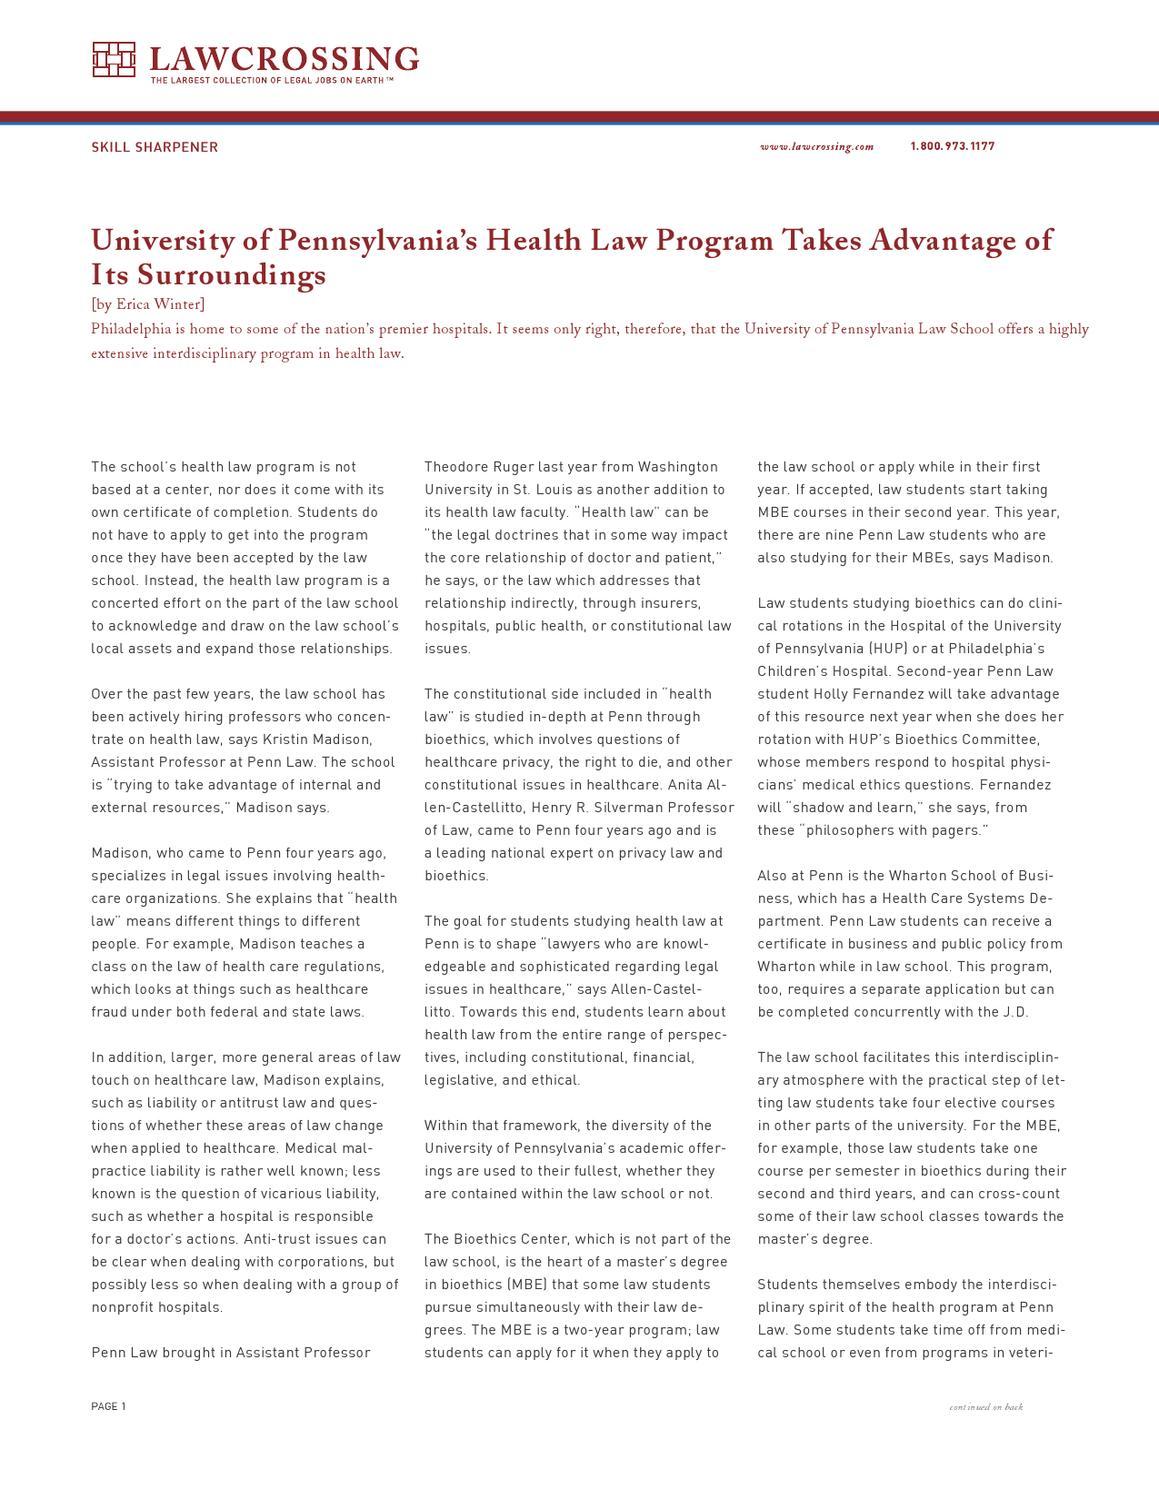 University of Pennsylvania's Health Law Program Takes Advantage of